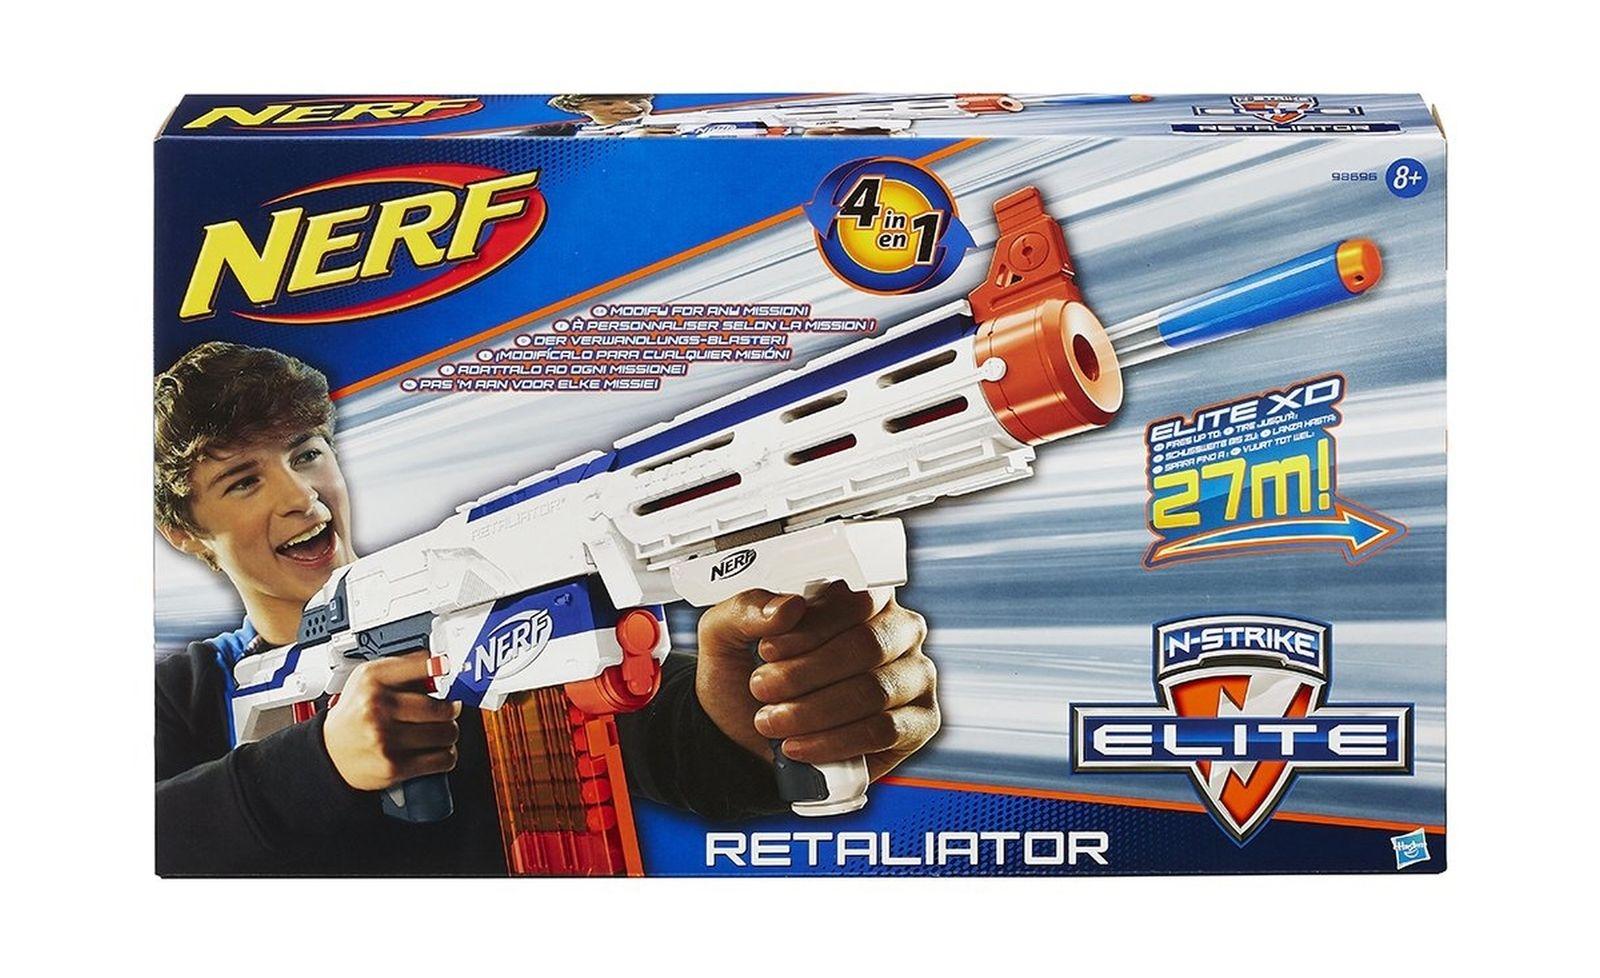 Nerf N-Strike retaliator ảnh 3